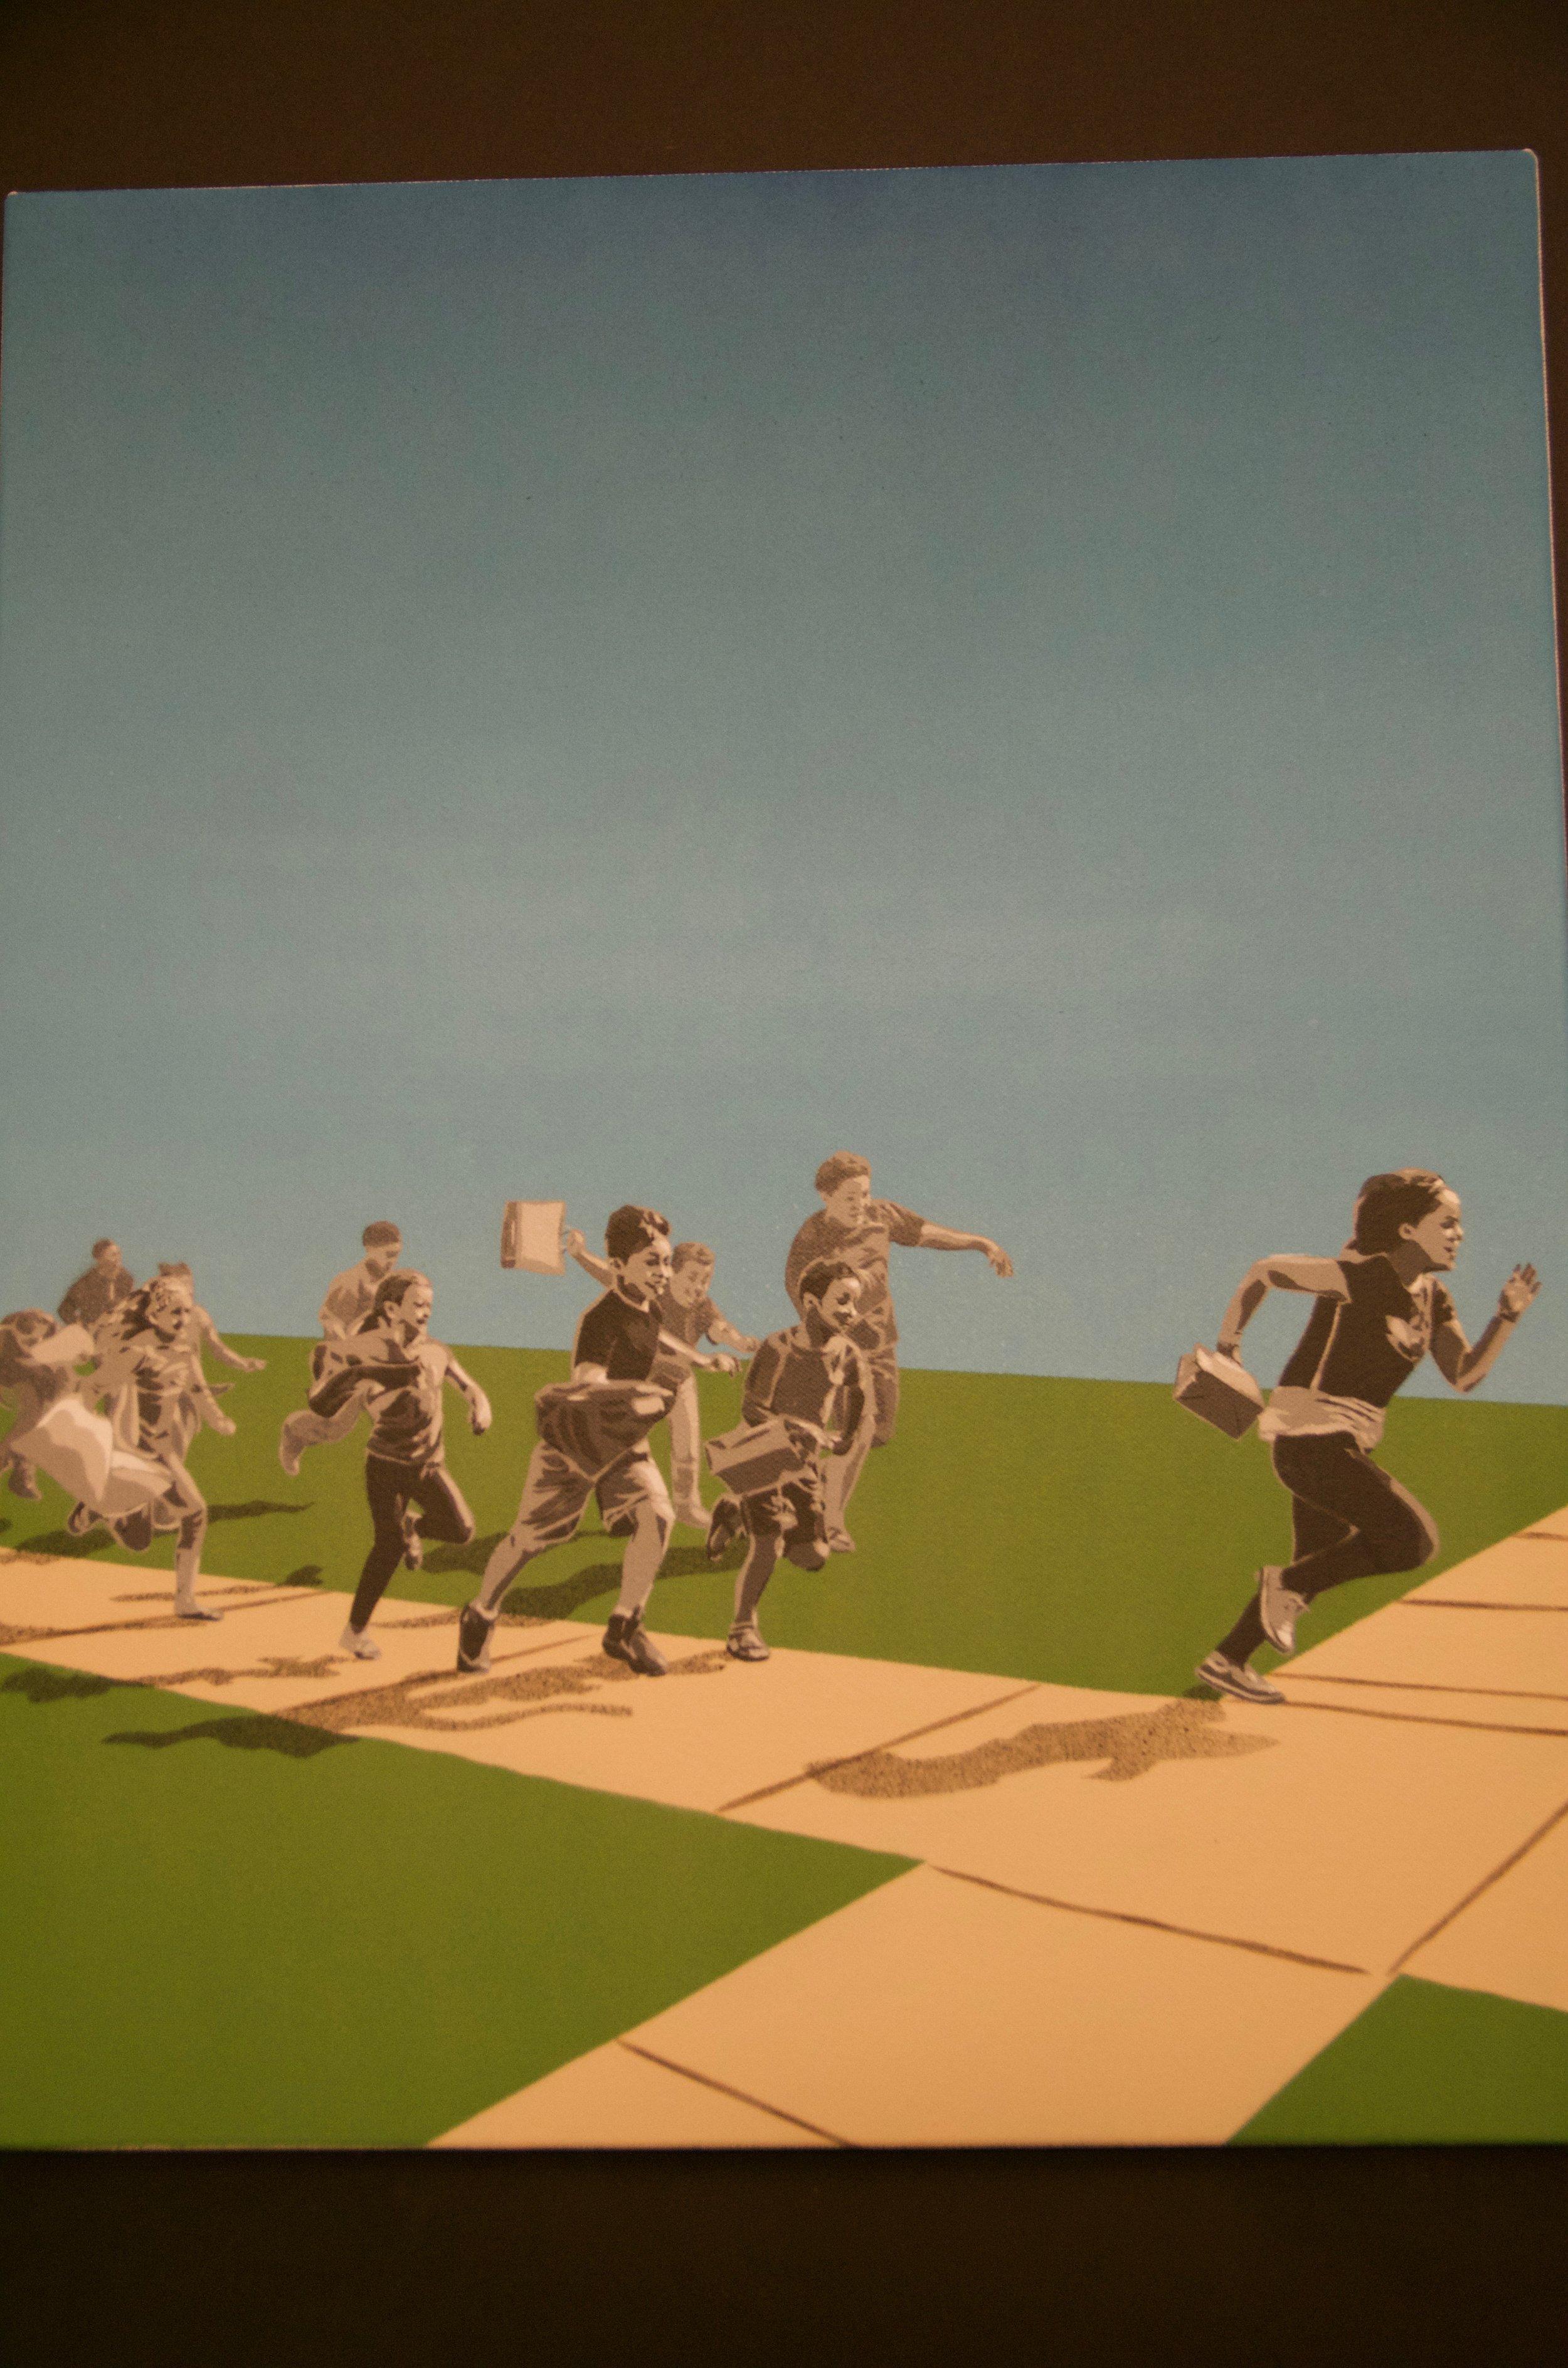 "FRED KAEMS   Hand-cut stencils and paint on canvas | 16""x20"" (unframed)   Value:  $450 |  Minimum bid:  $250"